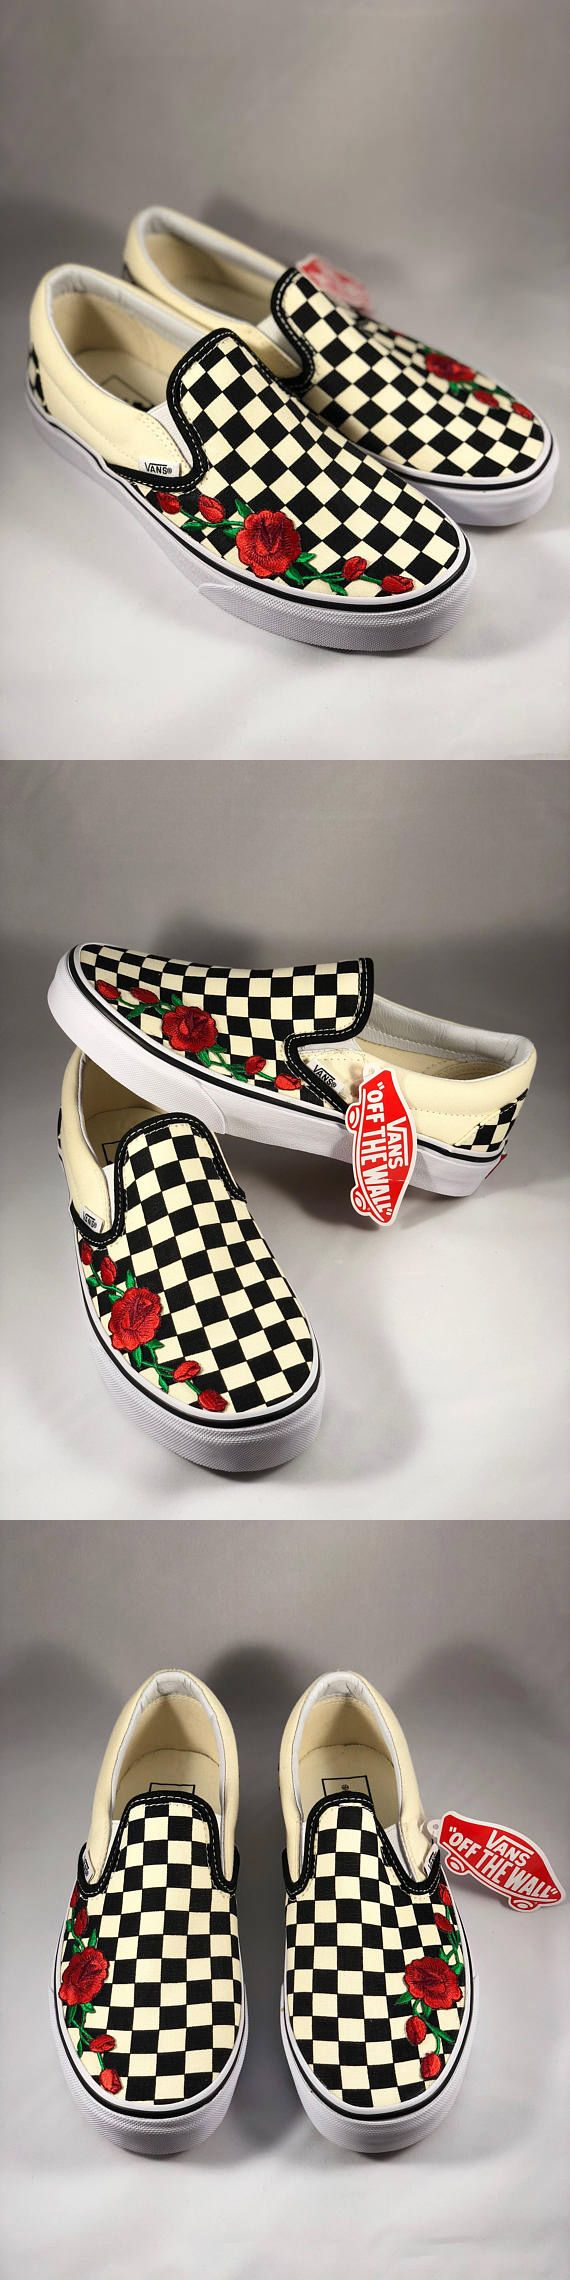 womens custom sneakers 8a30ce1cb4